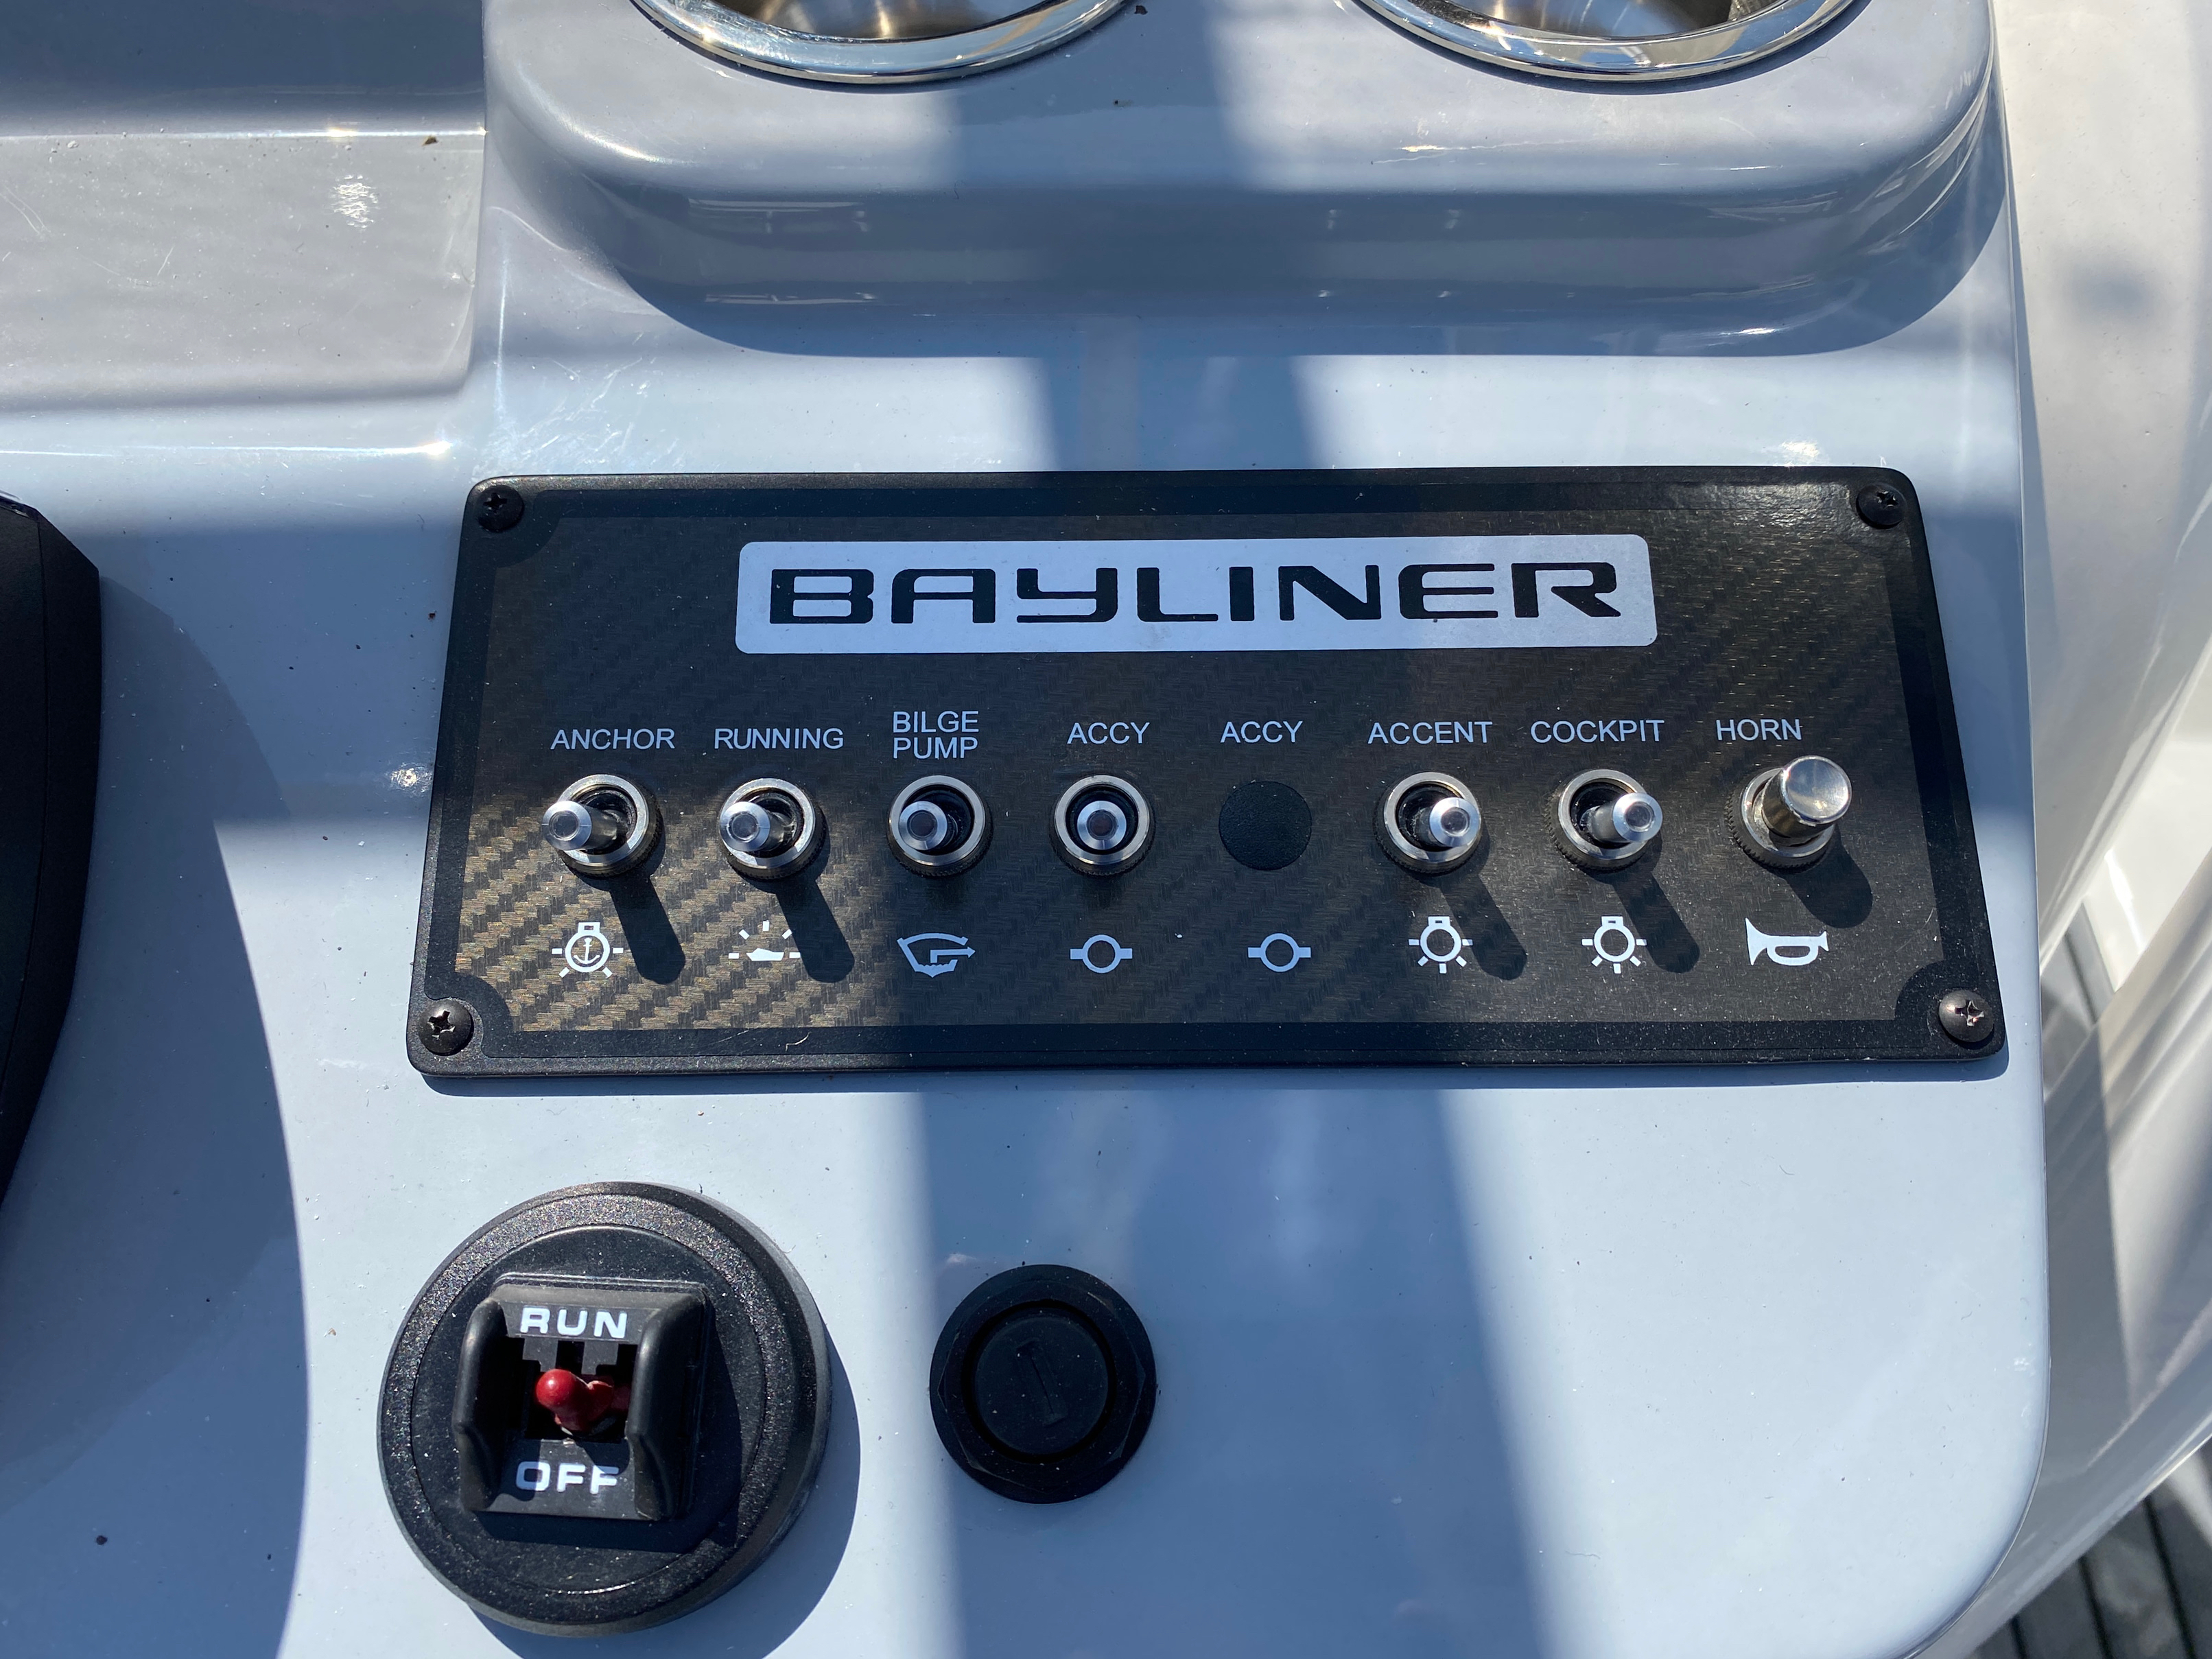 2020 Bayliner boat for sale, model of the boat is Trophy 22CC & Image # 17 of 17